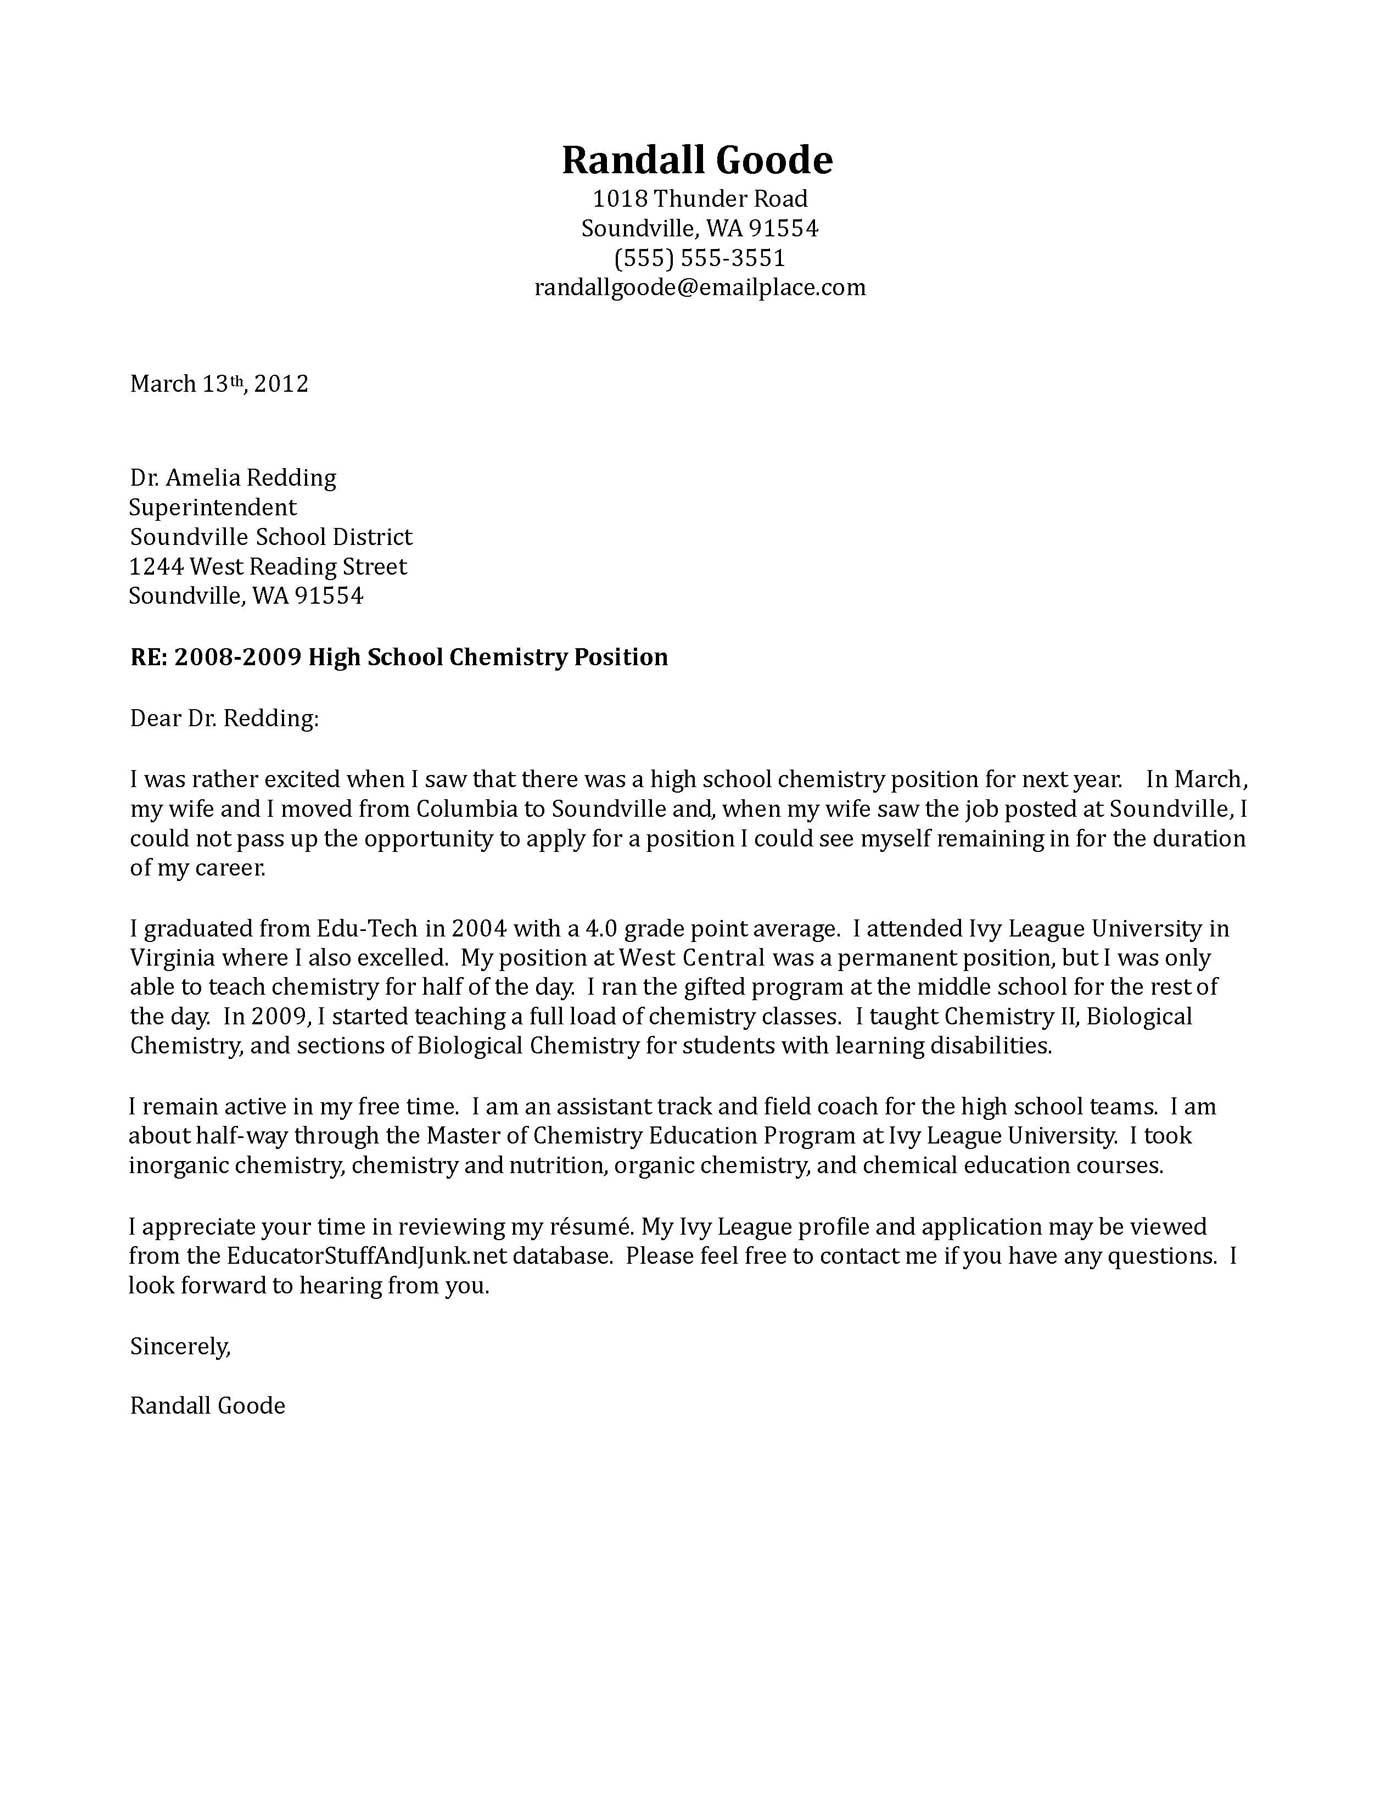 Rules In Writing Cover Letter Example Teacher In 2020 Teacher